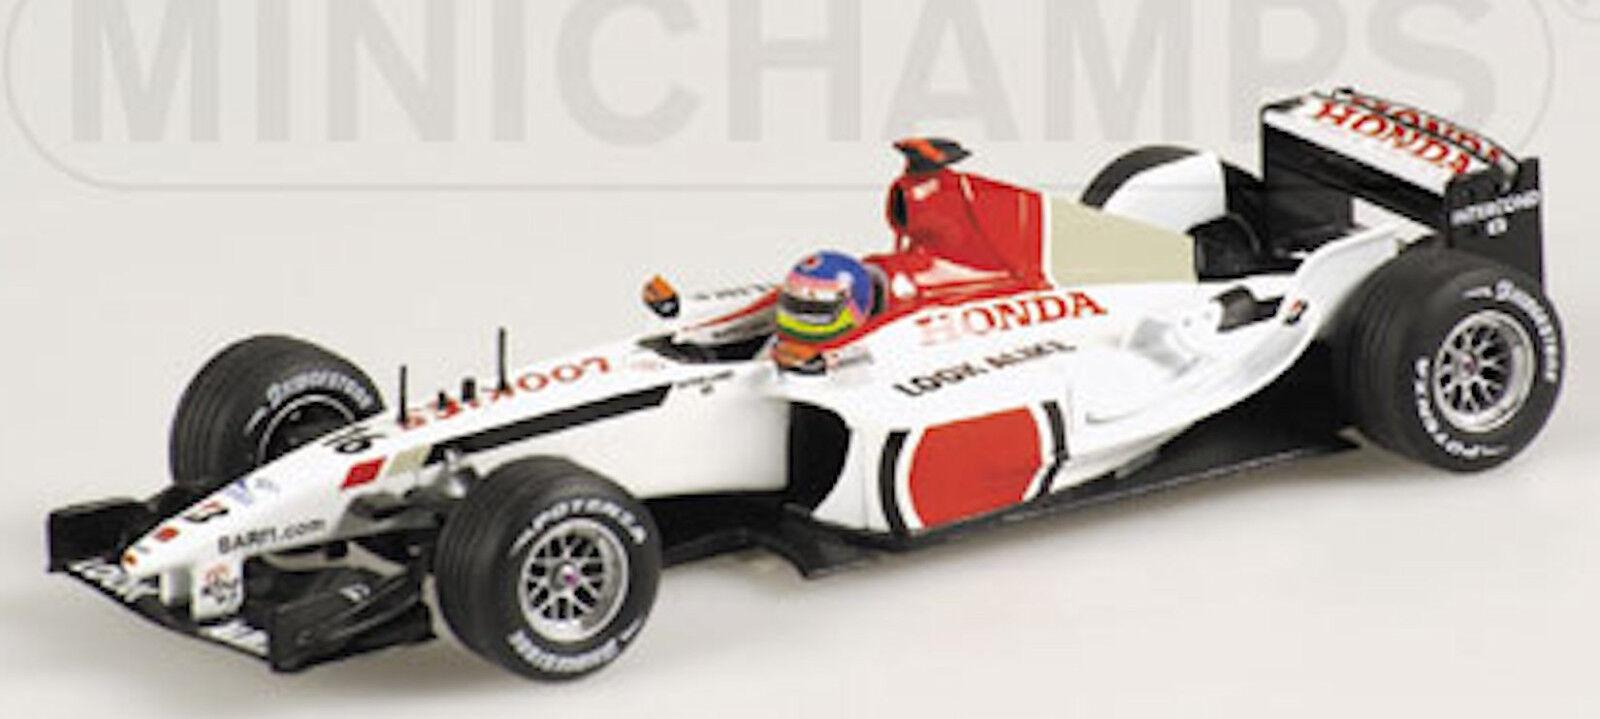 B. A. R. Honda 005 J. Villeneuve 2003  16 1 43 Minichamps